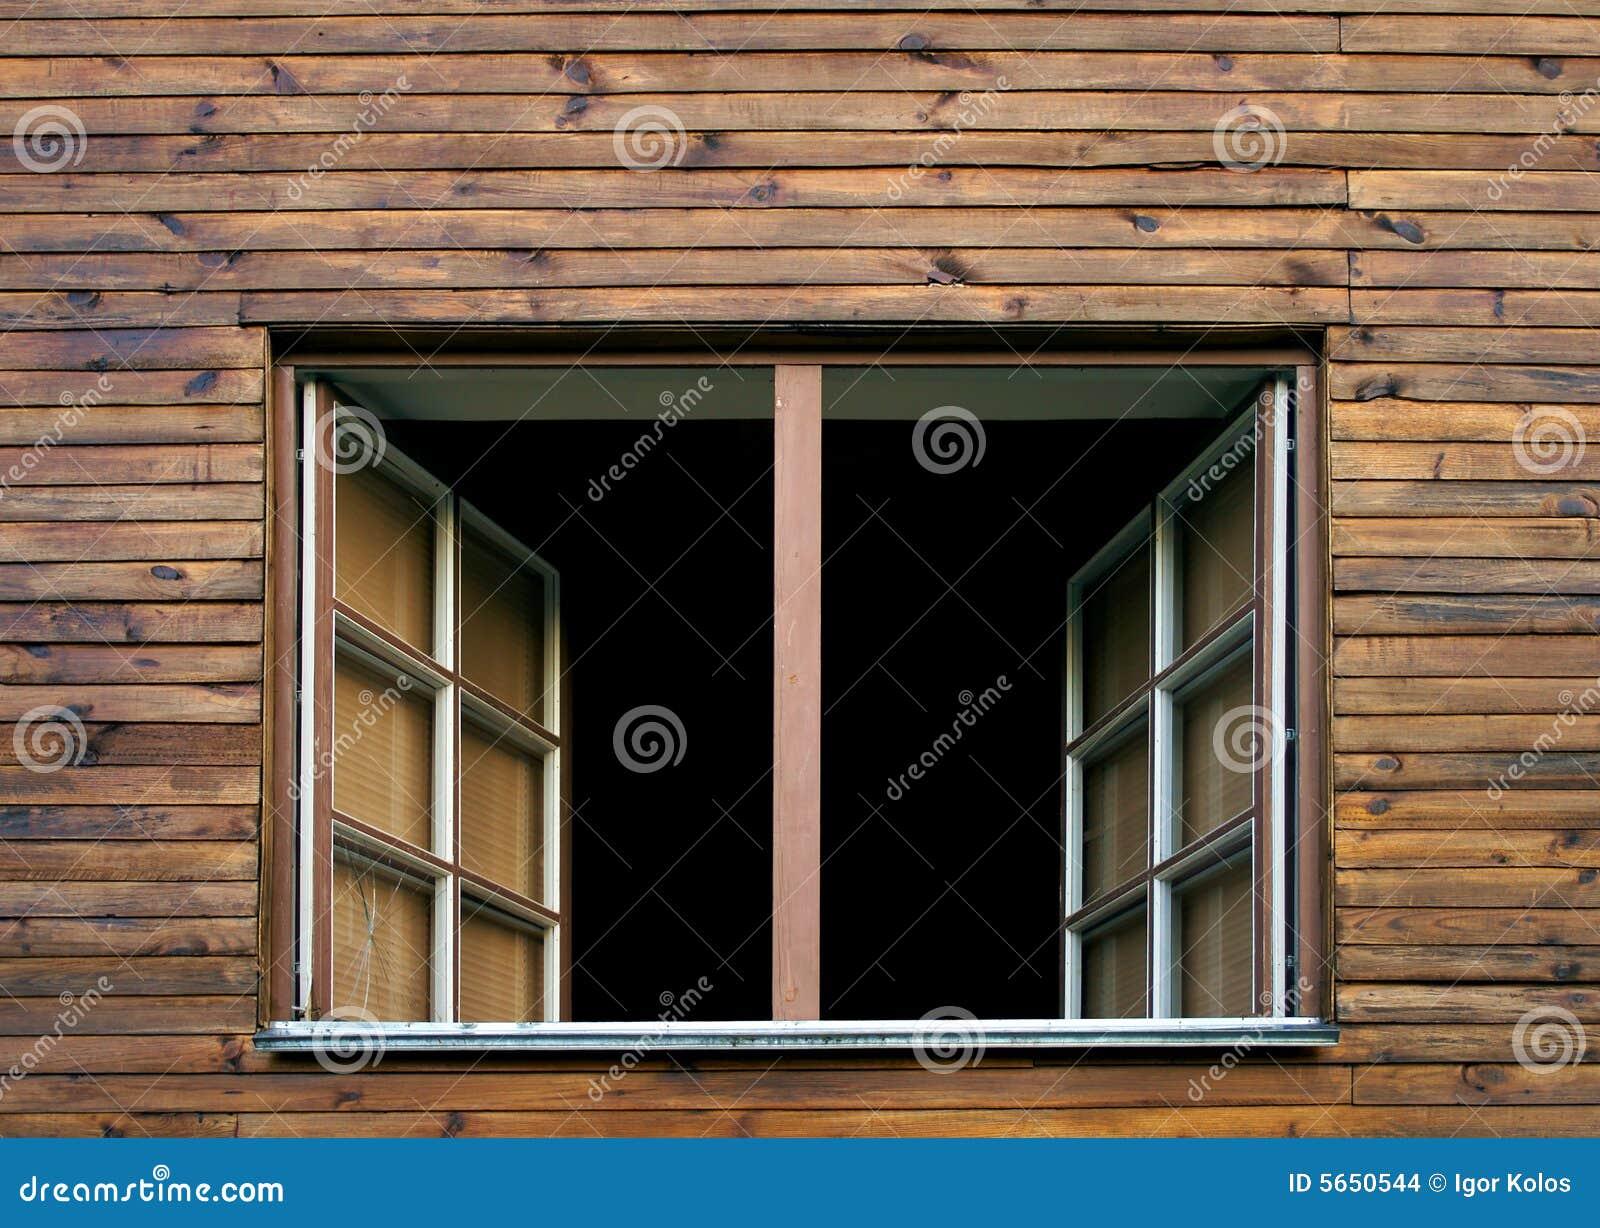 Open Window Stock Images - Image: 5650544